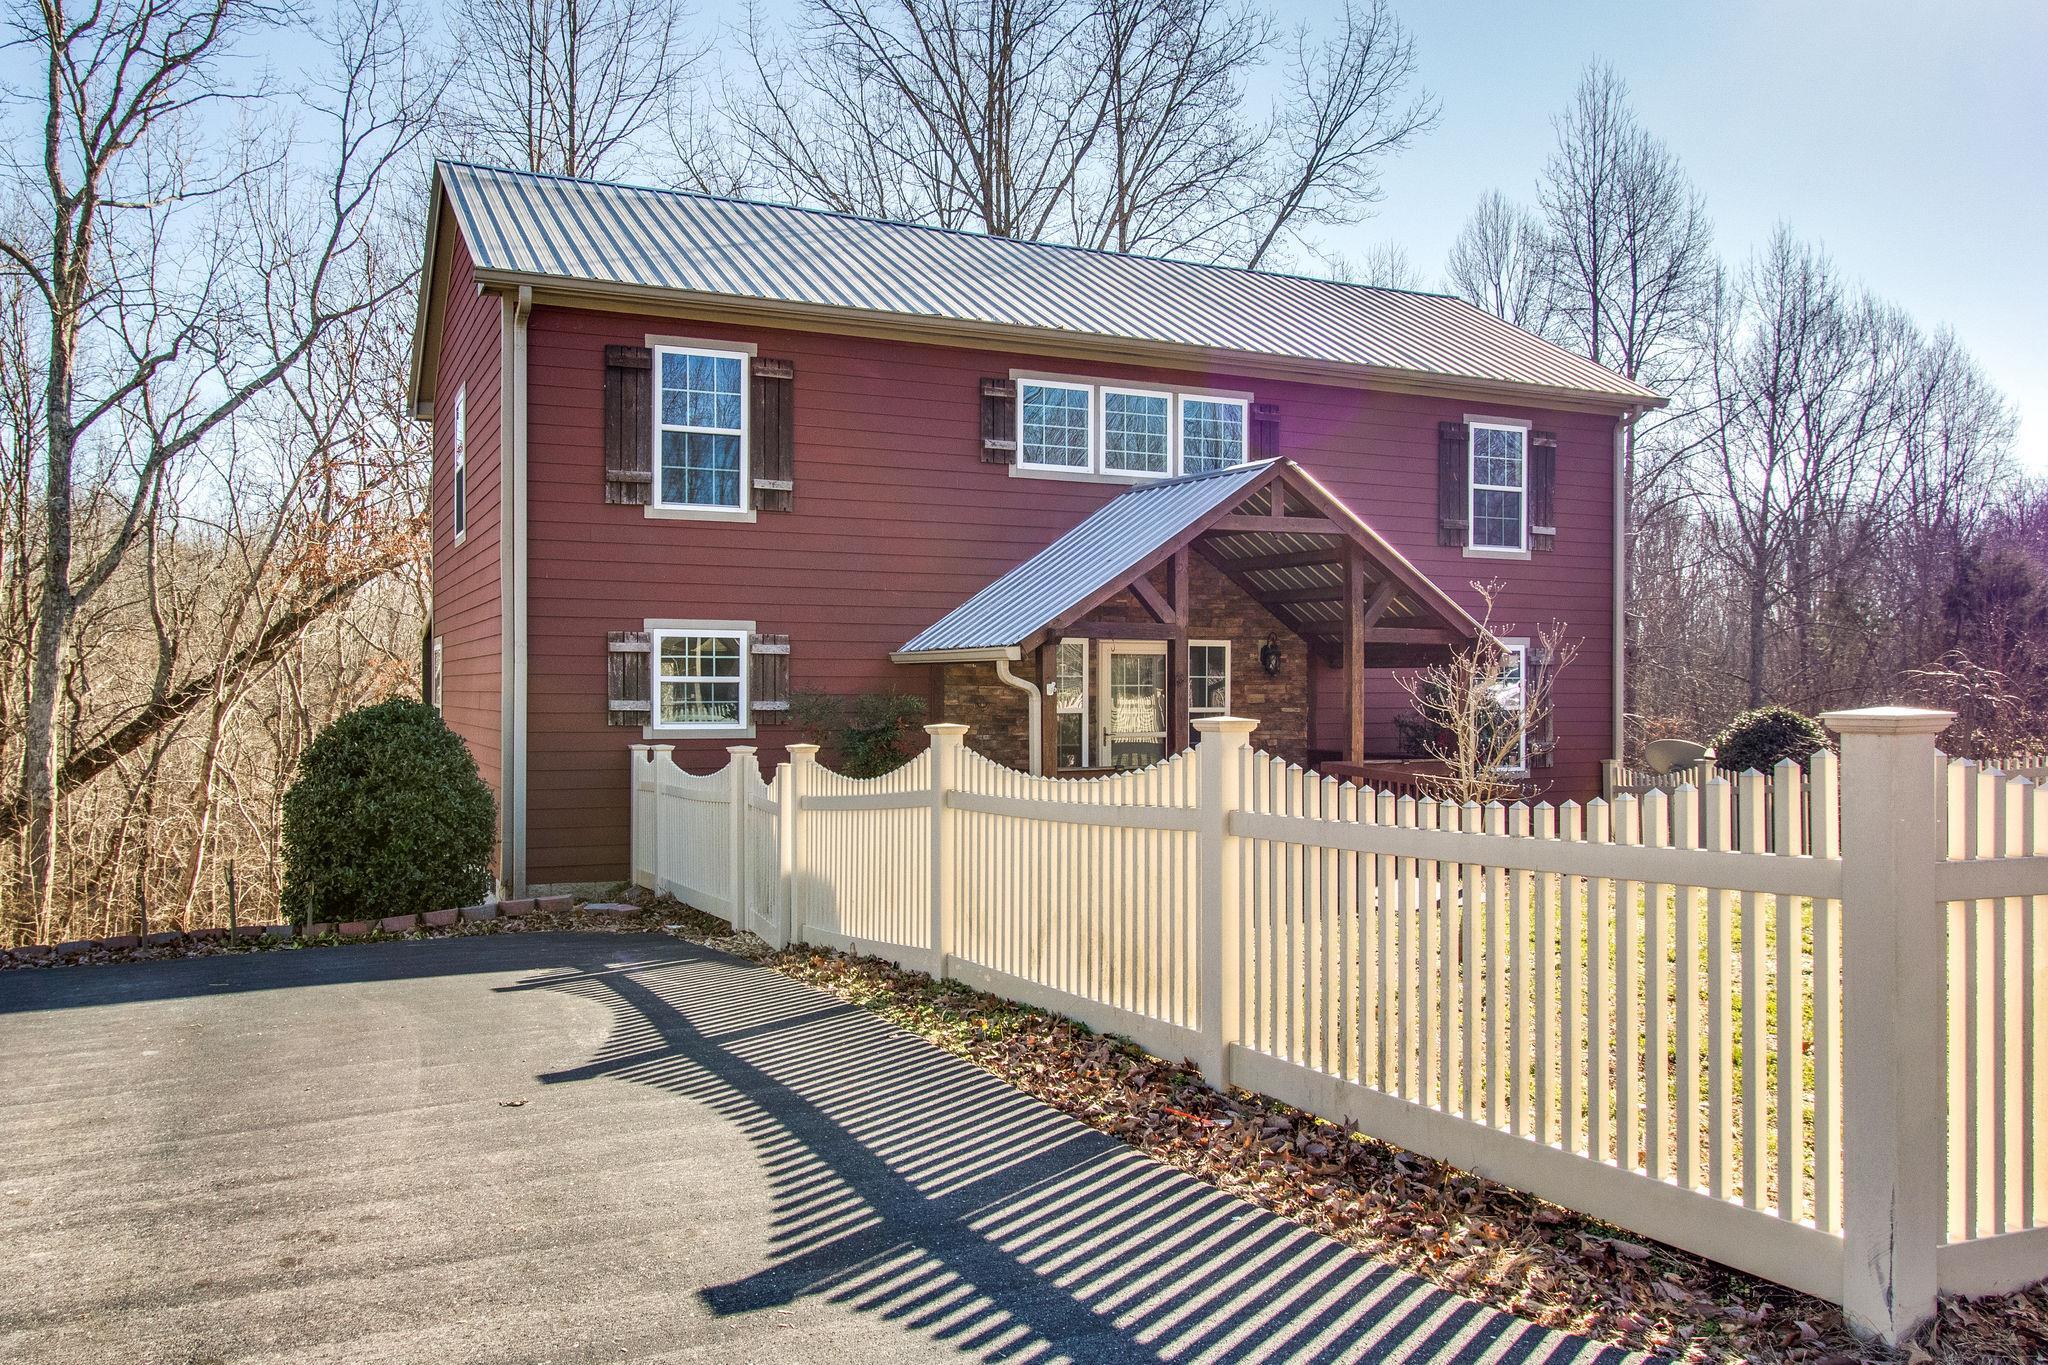 200 Shiloh Ln, Smithville, TN 37166 - Smithville, TN real estate listing